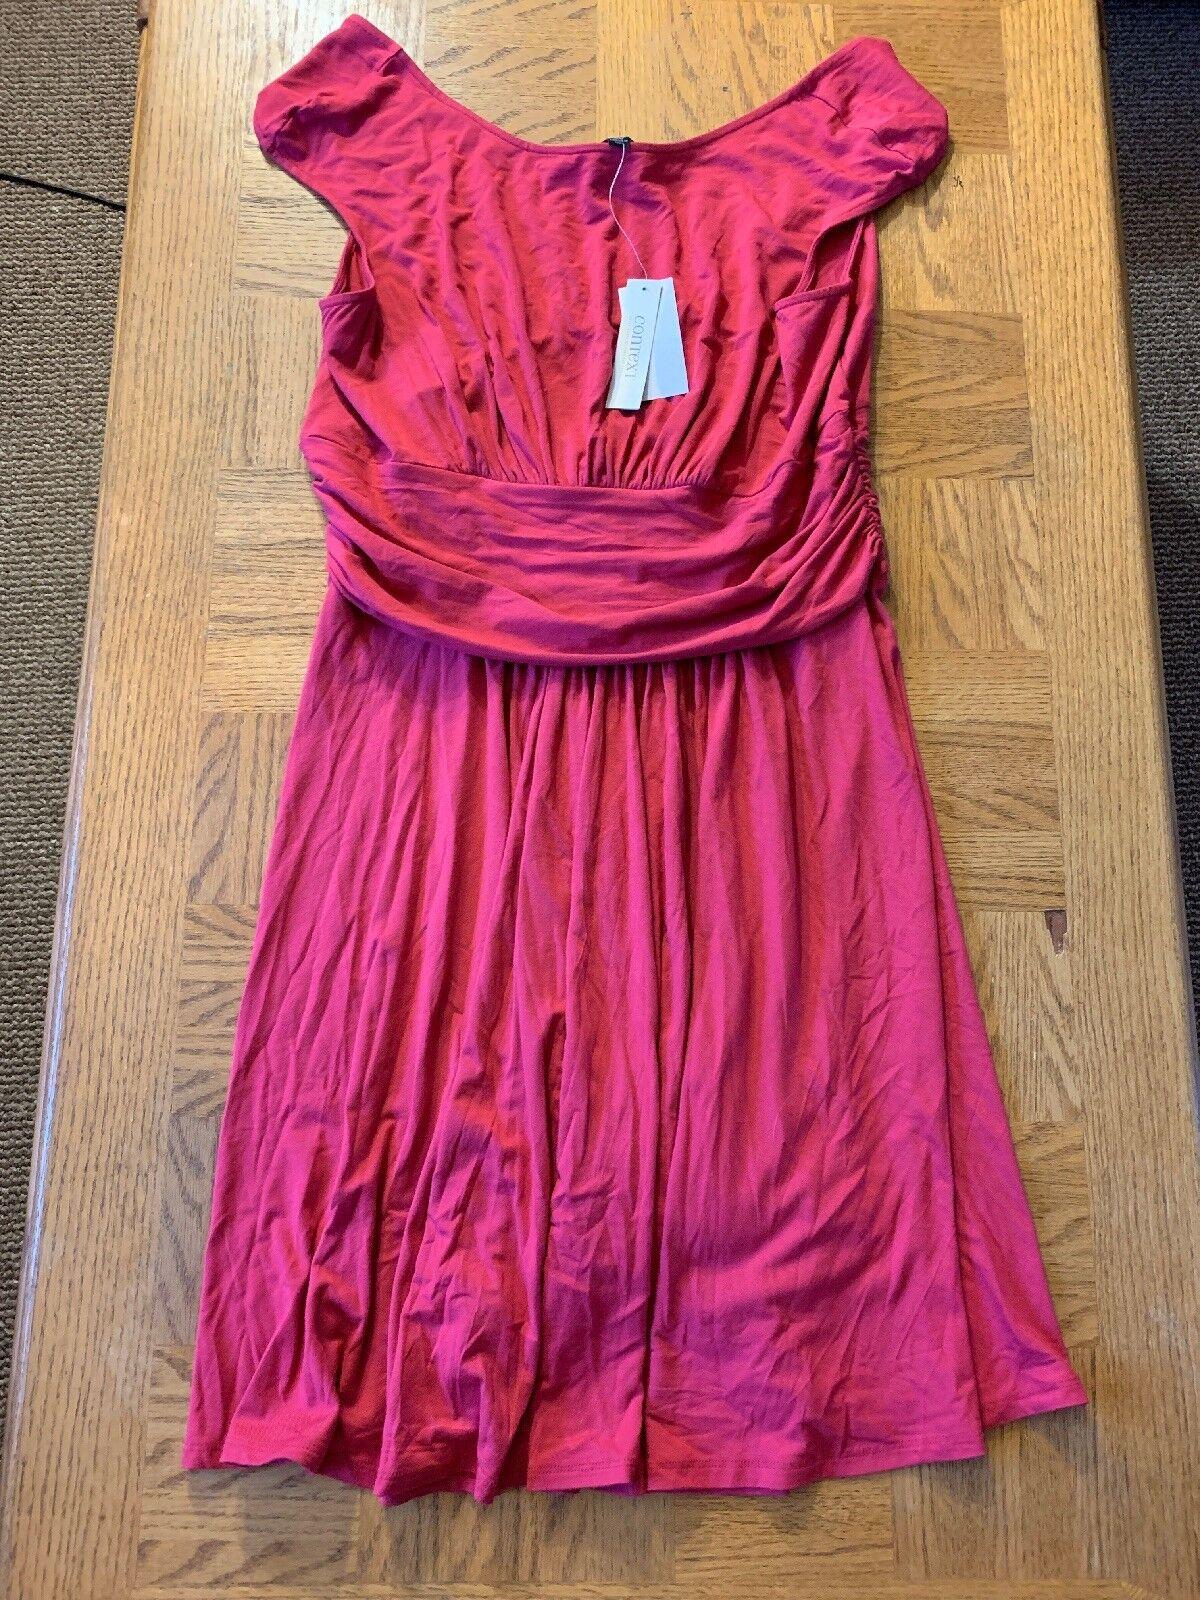 7b8e411bd6c9d Context Womens Dress Size 1X 0101 nrpjjy1108-Dresses